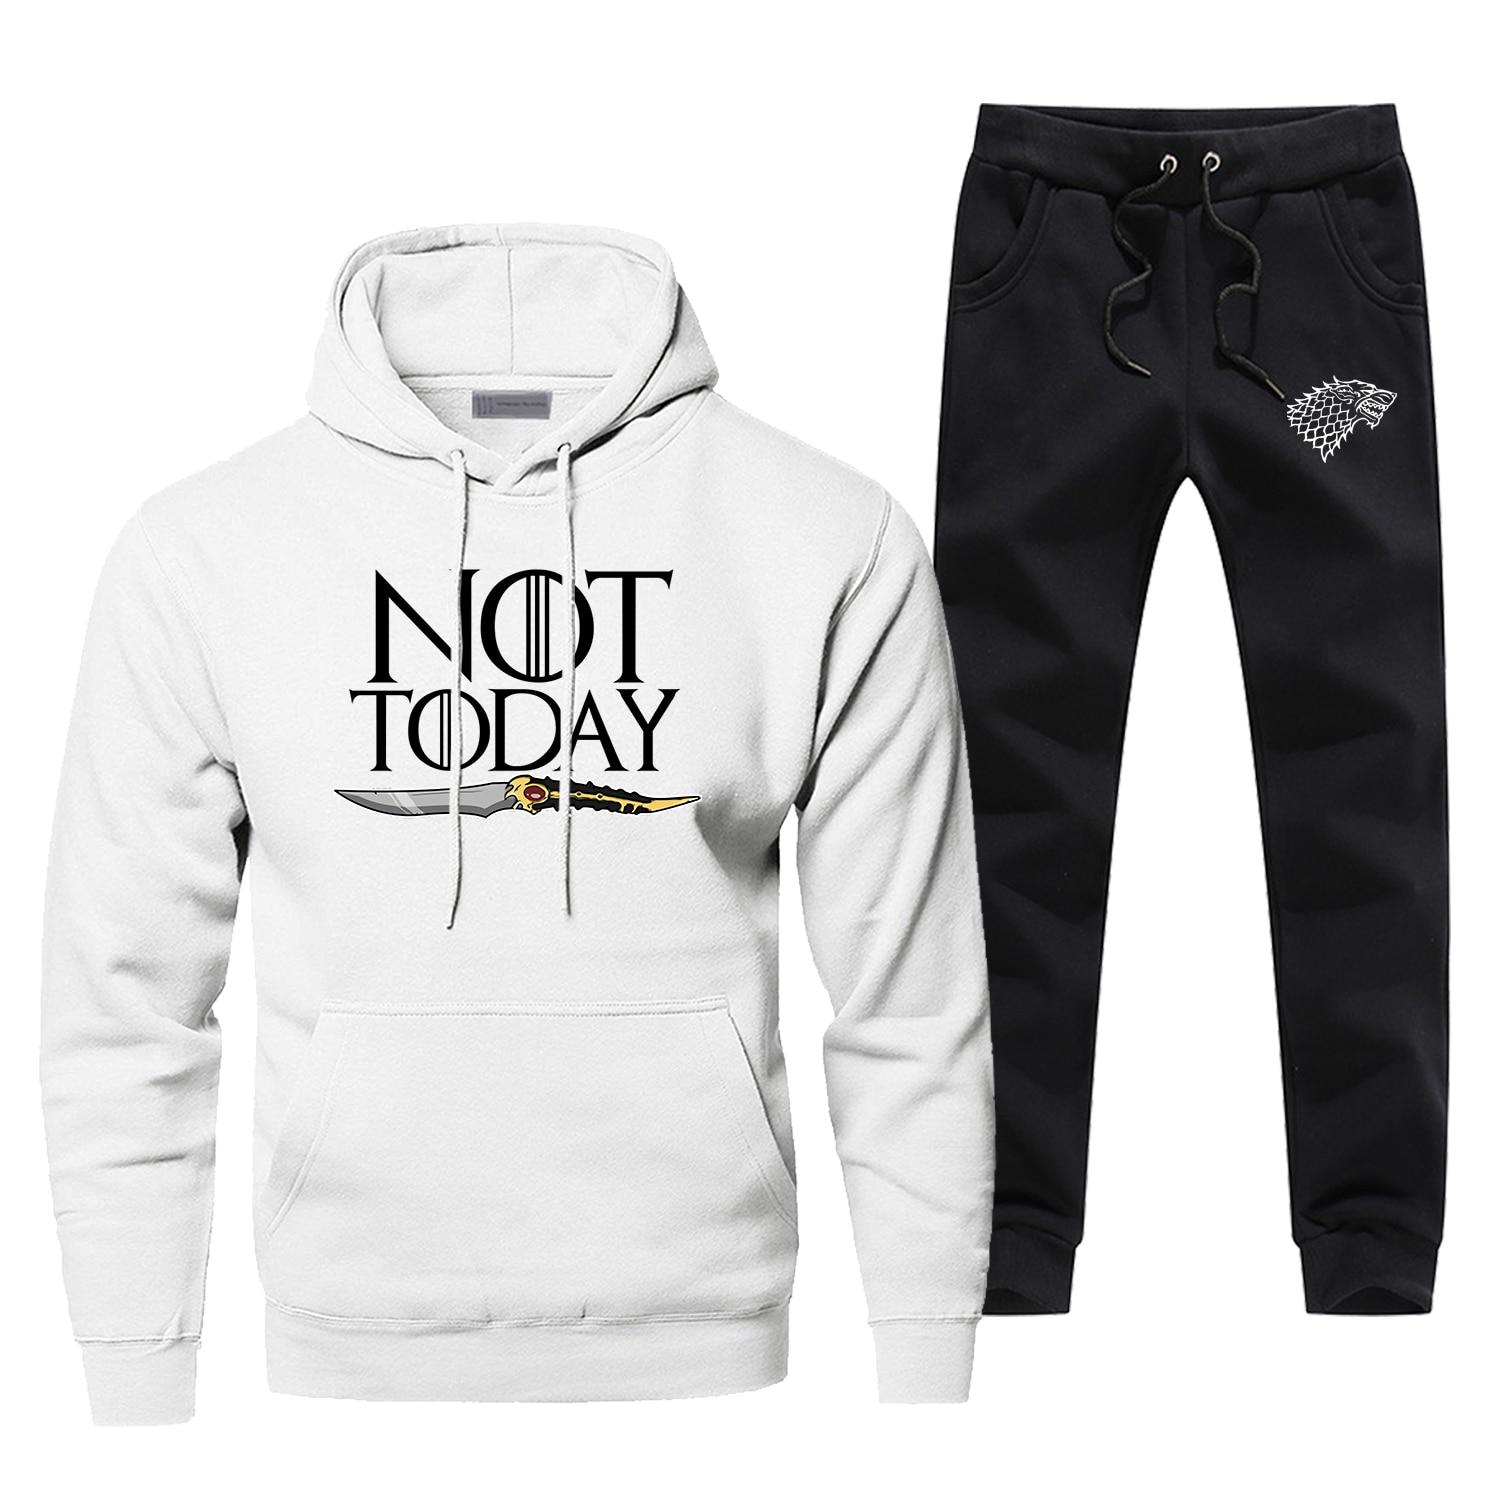 Game Of Thrones Not Today Hoodies Pants Men Sets Track Suit Sweatshirt Sweatpants Ayra House Stark Autumn Sports 2 PCS Tracksuit